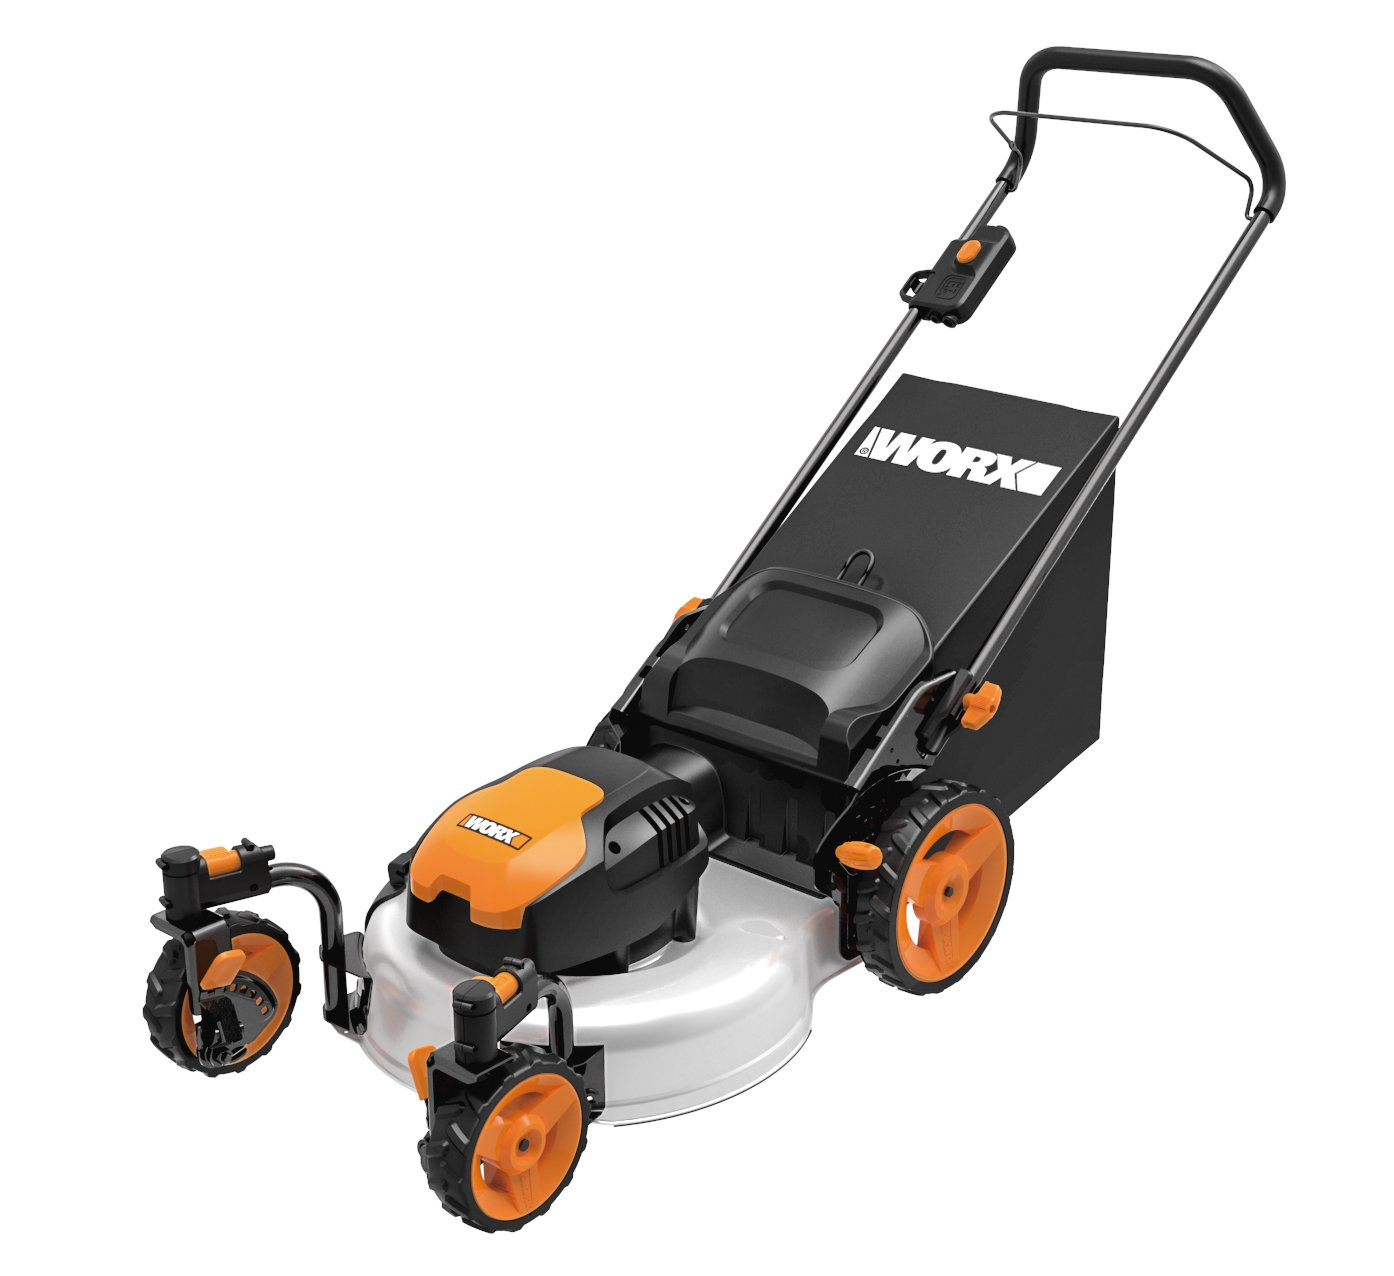 WORX Wheeled Electric Lawn Mower